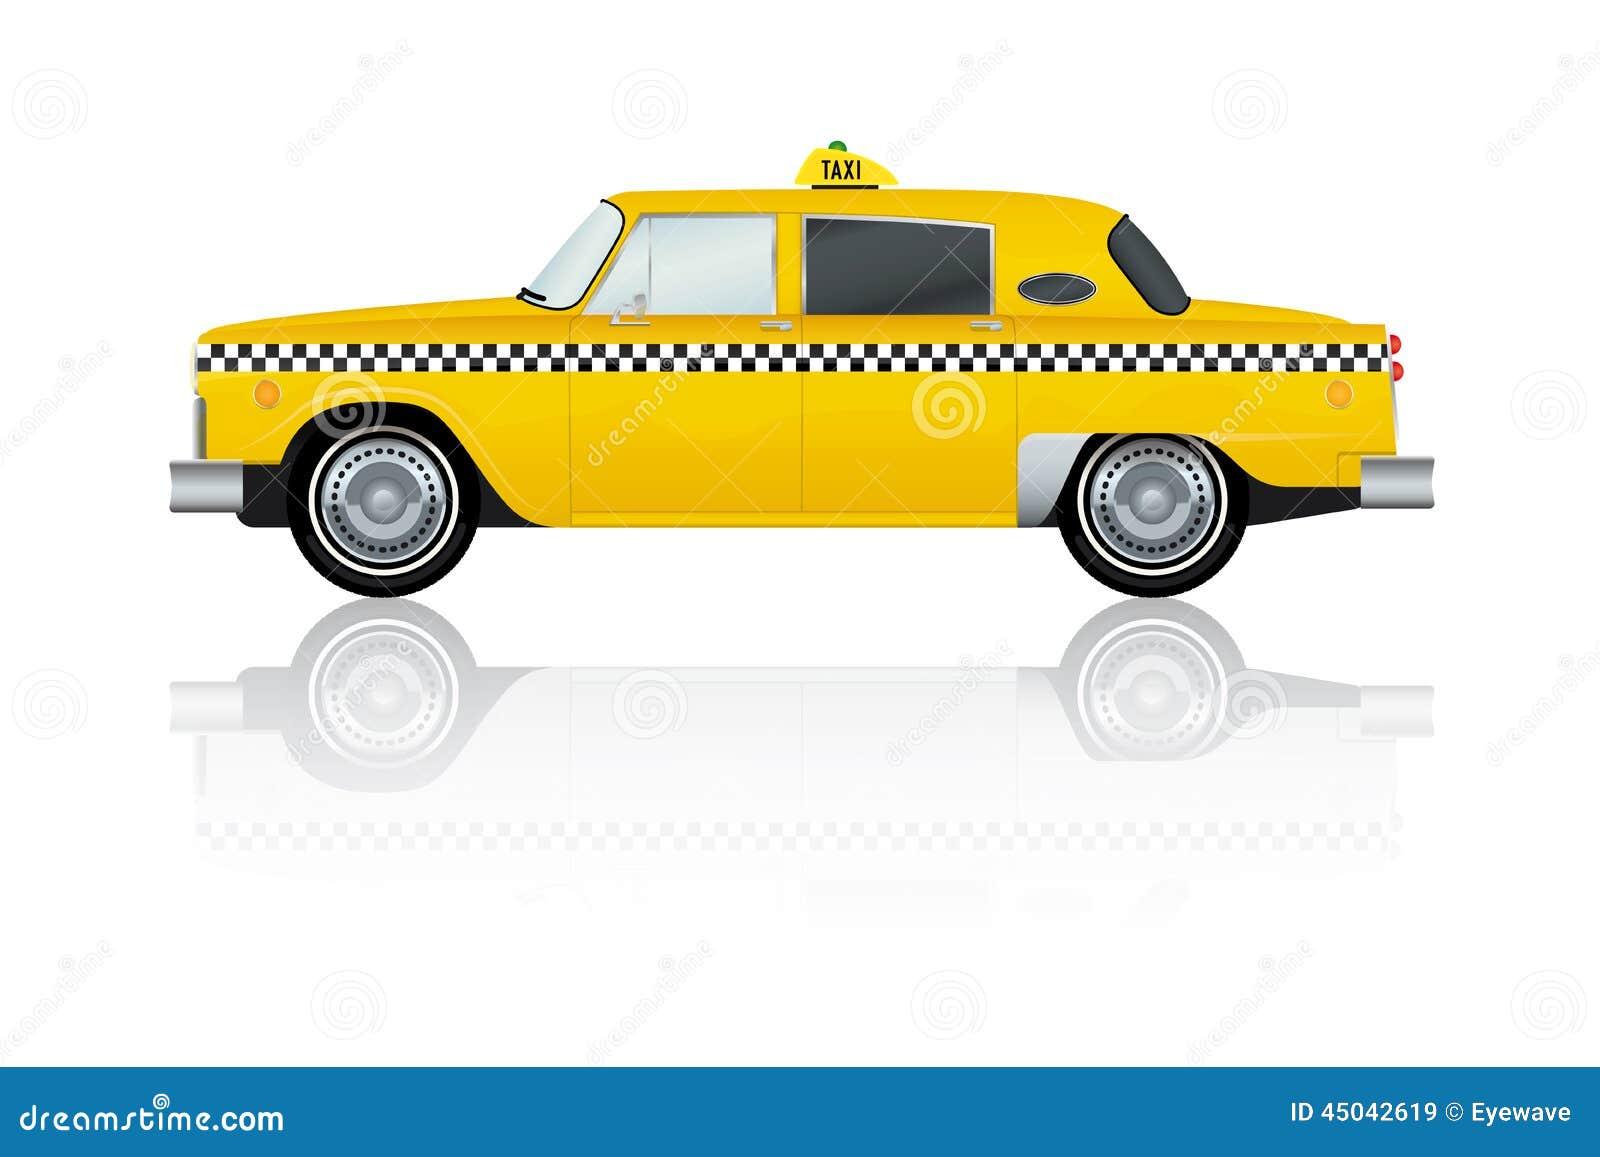 Bike taxi business plan